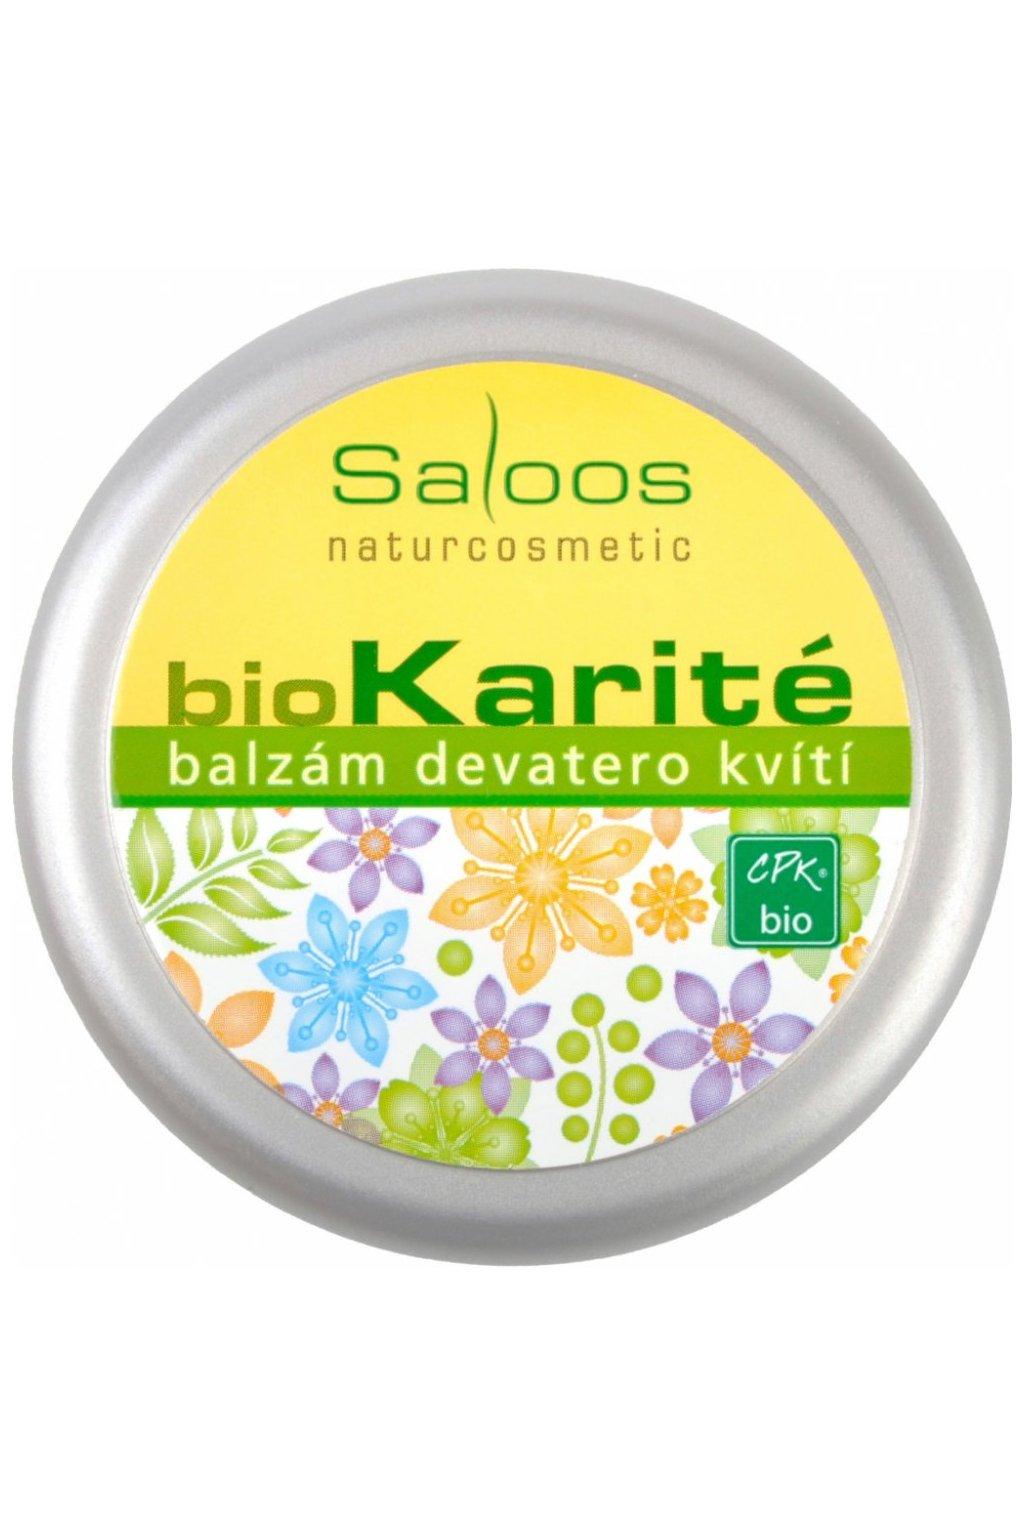 11759 saloos bio karite devatero kviti bio balzam 19 ml